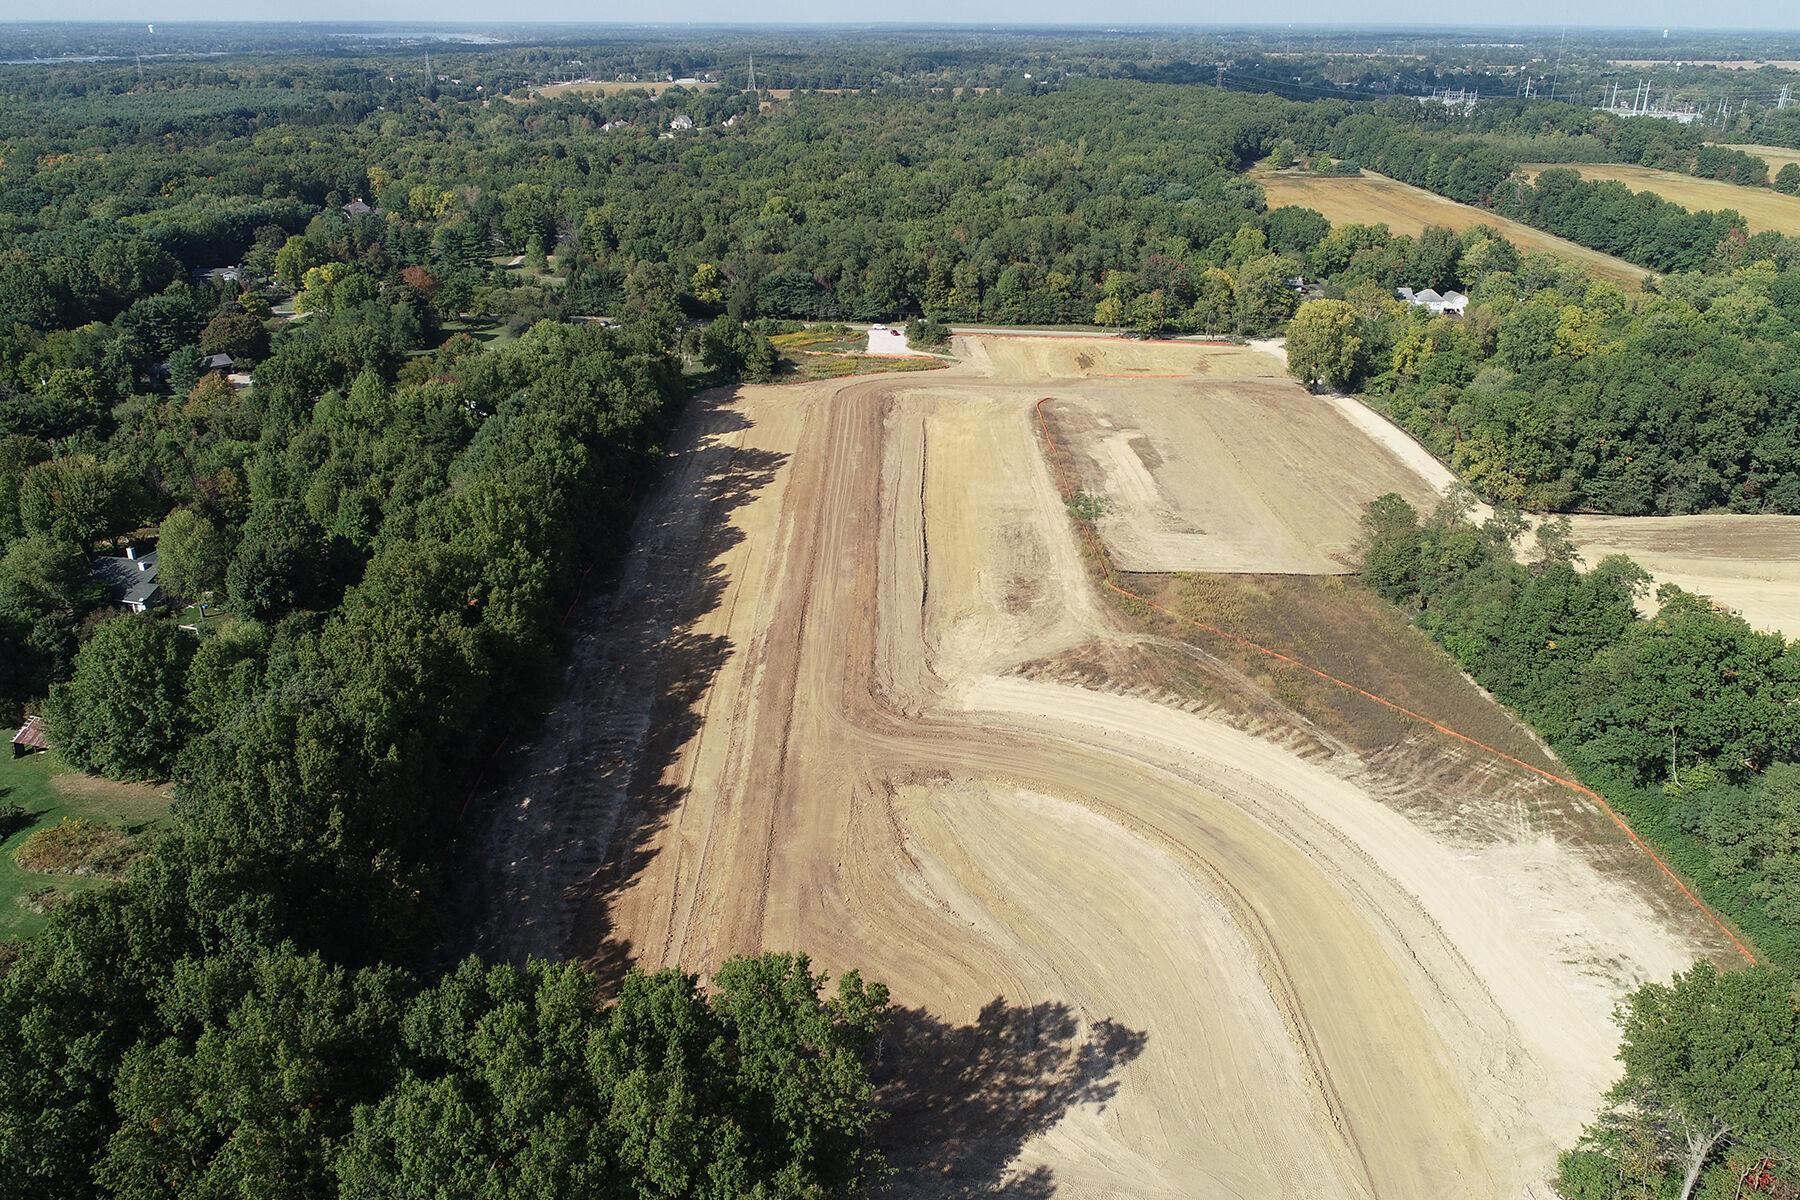 Walnut Woods Aerial